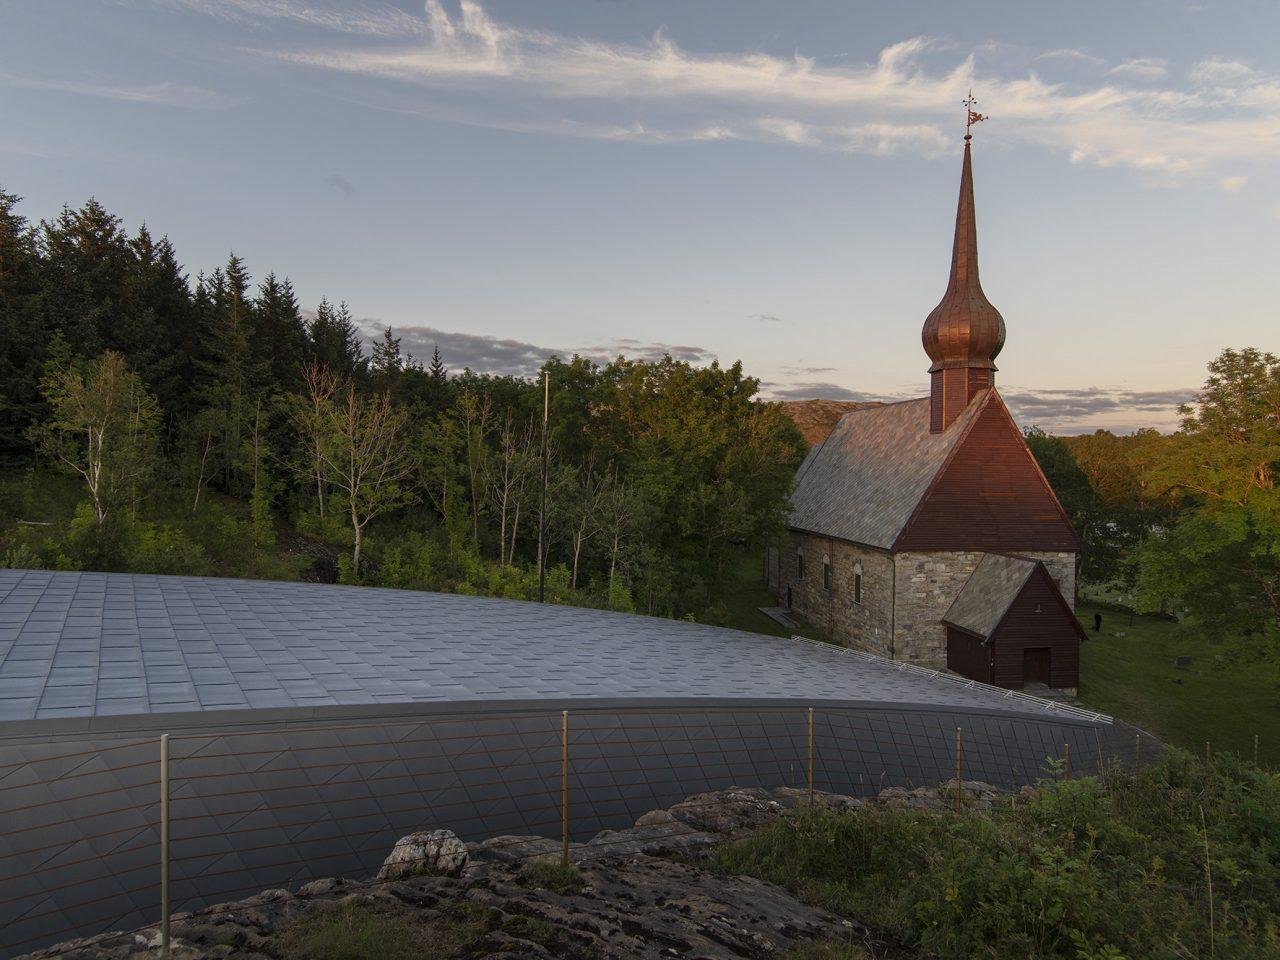 Petter Dass Alstahaug Kirke Ute